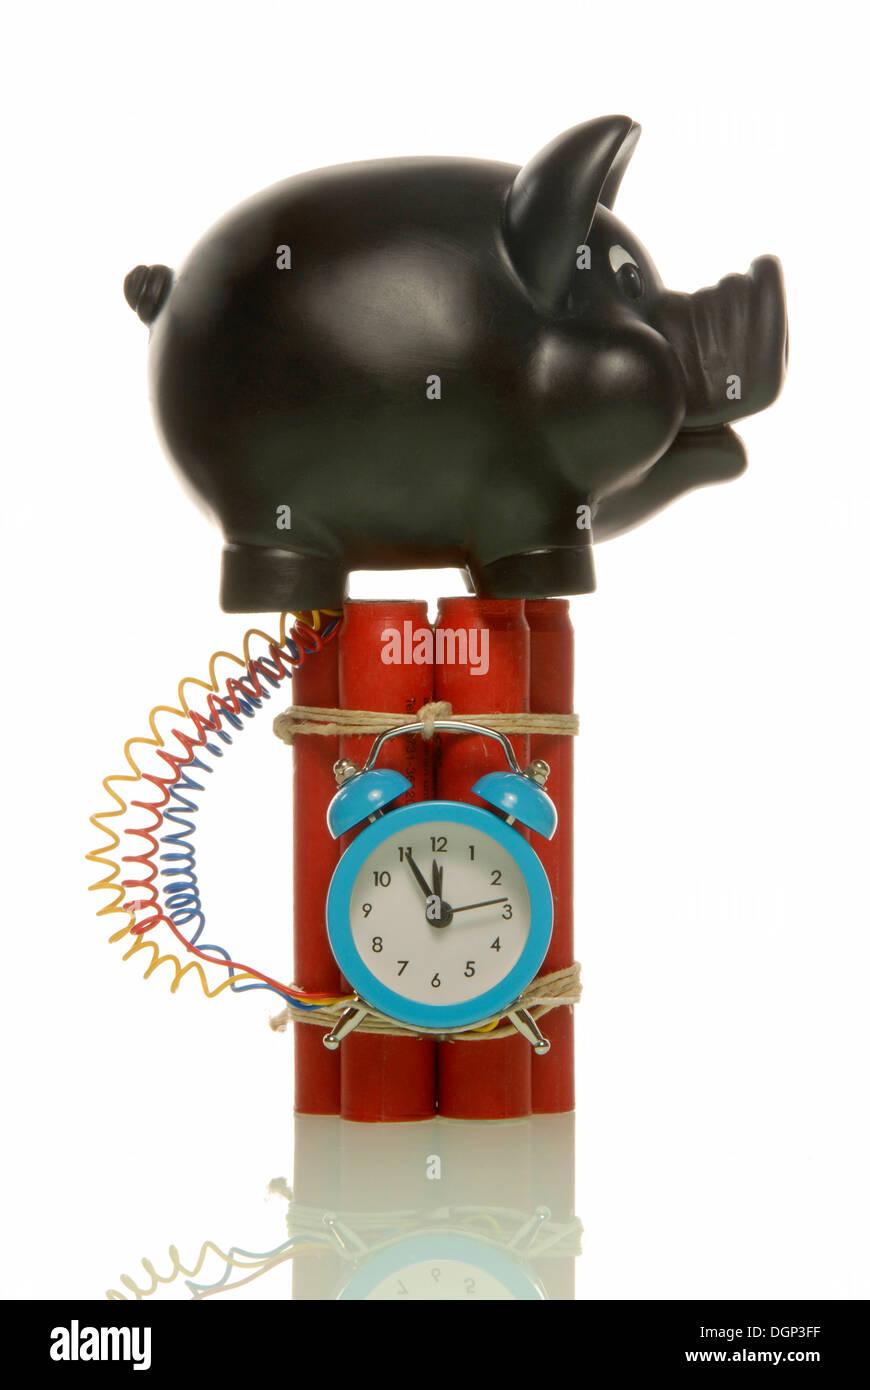 Hucha sobre una bomba, imagen simbólica para ahorro arriesgado Foto de stock